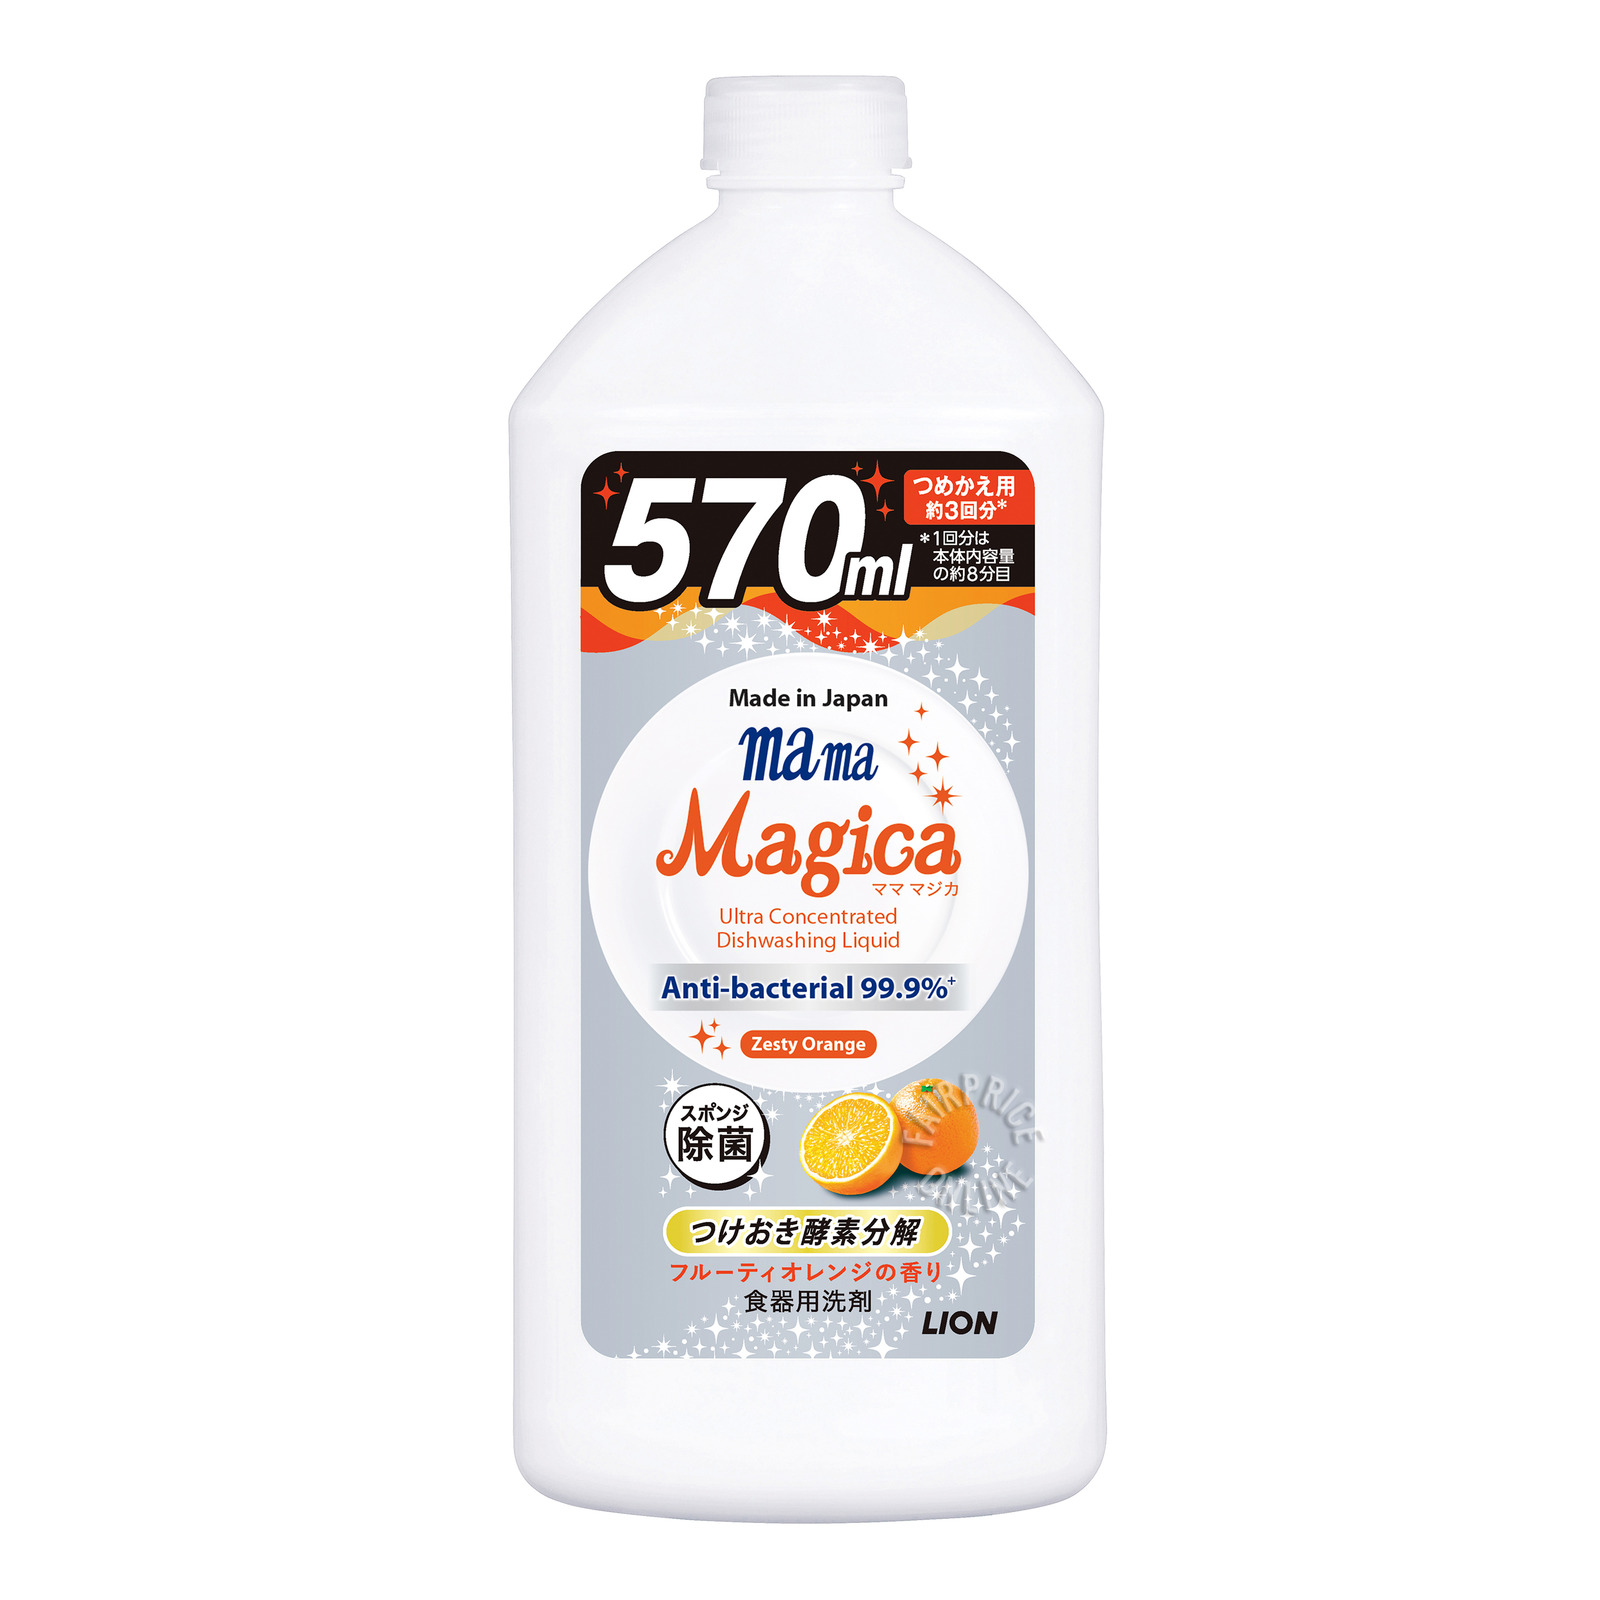 Mama Magica Dishwashing Liquid Refill - Zesty Orange